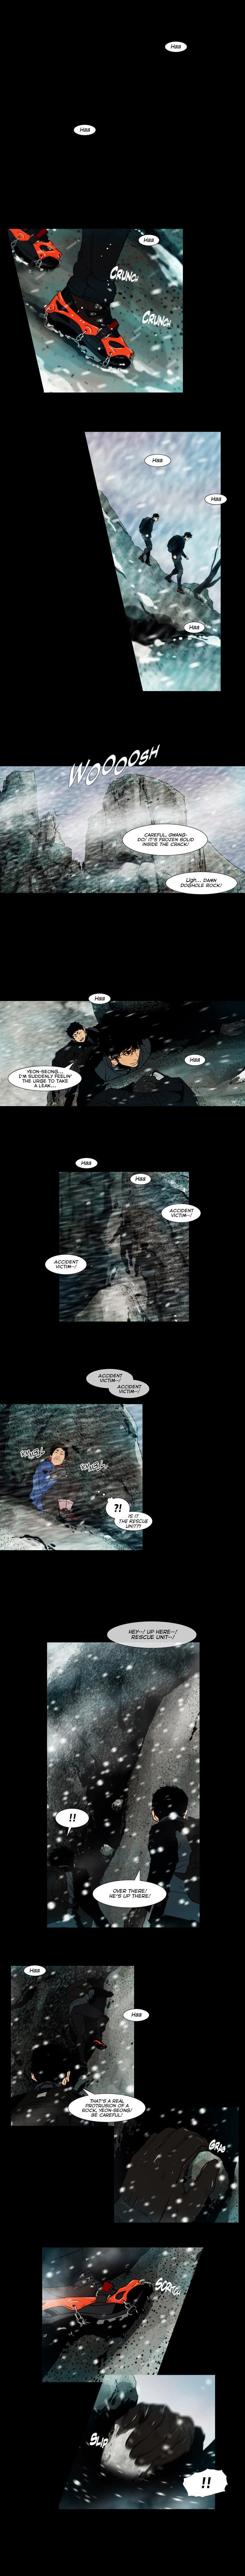 Peak (Im Gang-hyeok) 87 Page 2